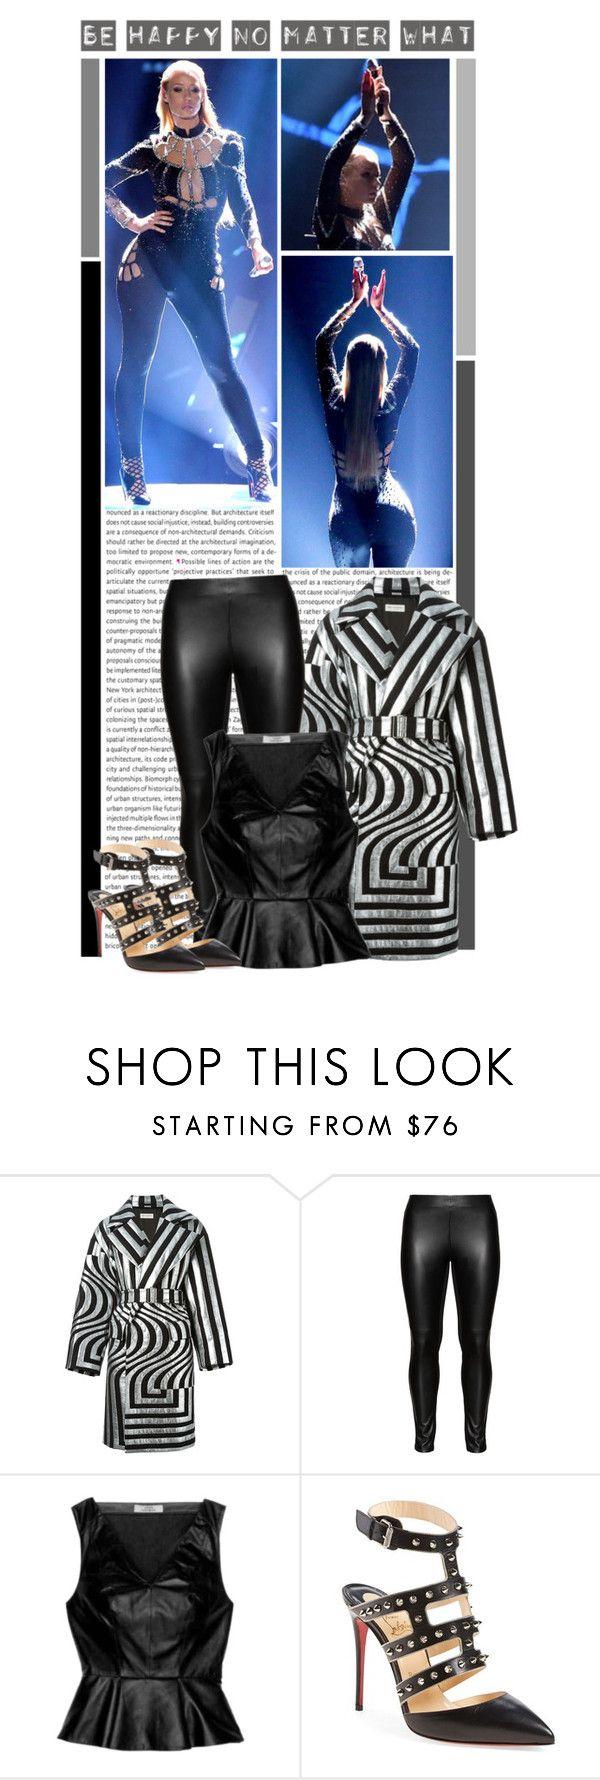 """#1250 (Iggy Azalea)"" by lauren1993 ❤ liked on Polyvore featuring Oris, Versace, Dries Van Noten, Studio, Robert Rodriguez, Christian Louboutin, women's clothing, women, female and woman"